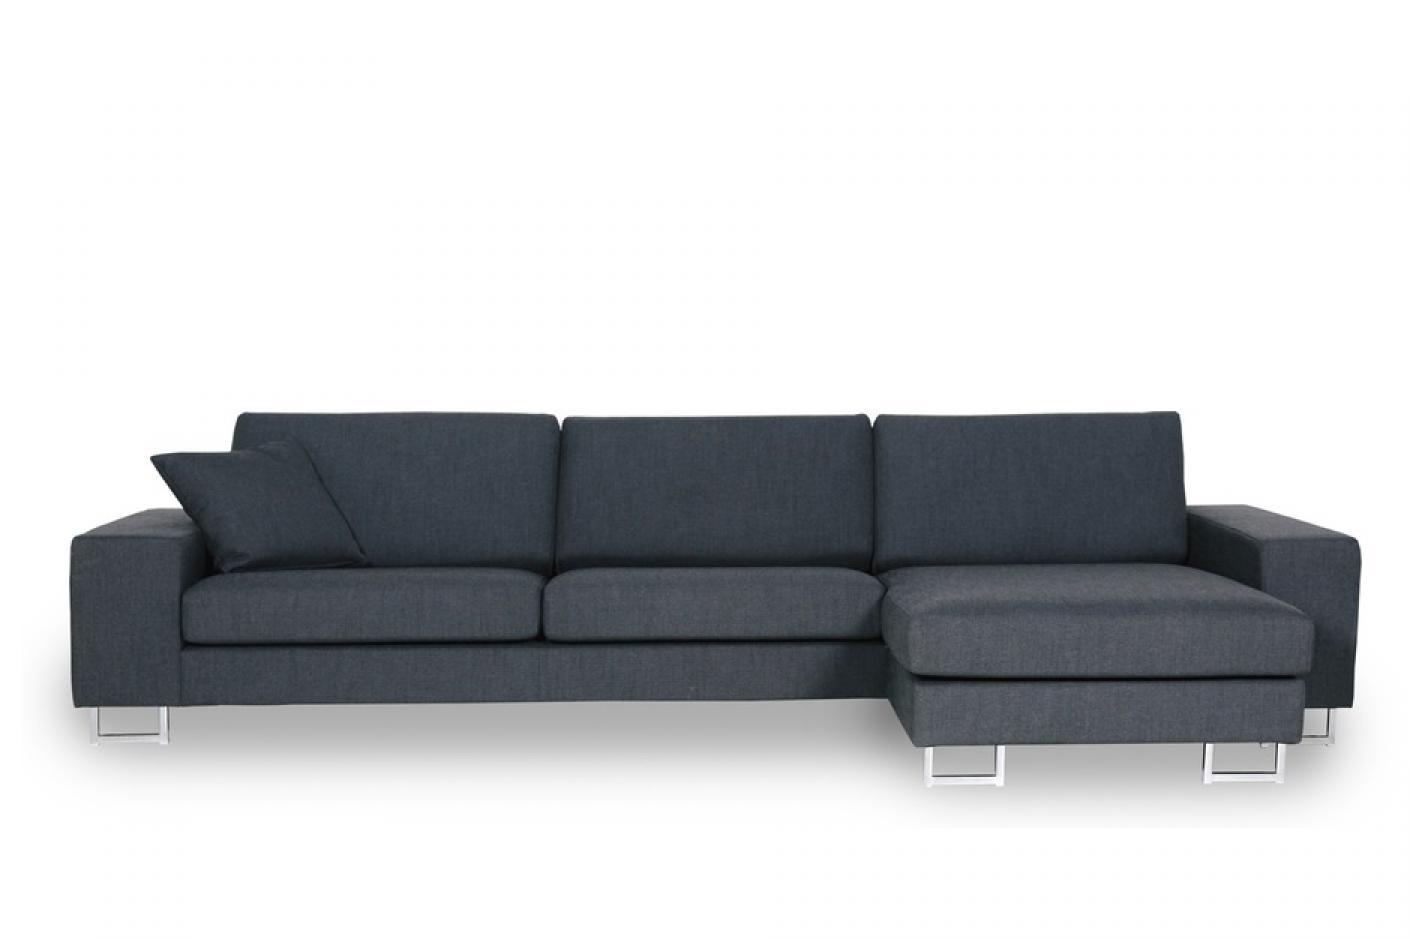 photos canap quattro sits. Black Bedroom Furniture Sets. Home Design Ideas